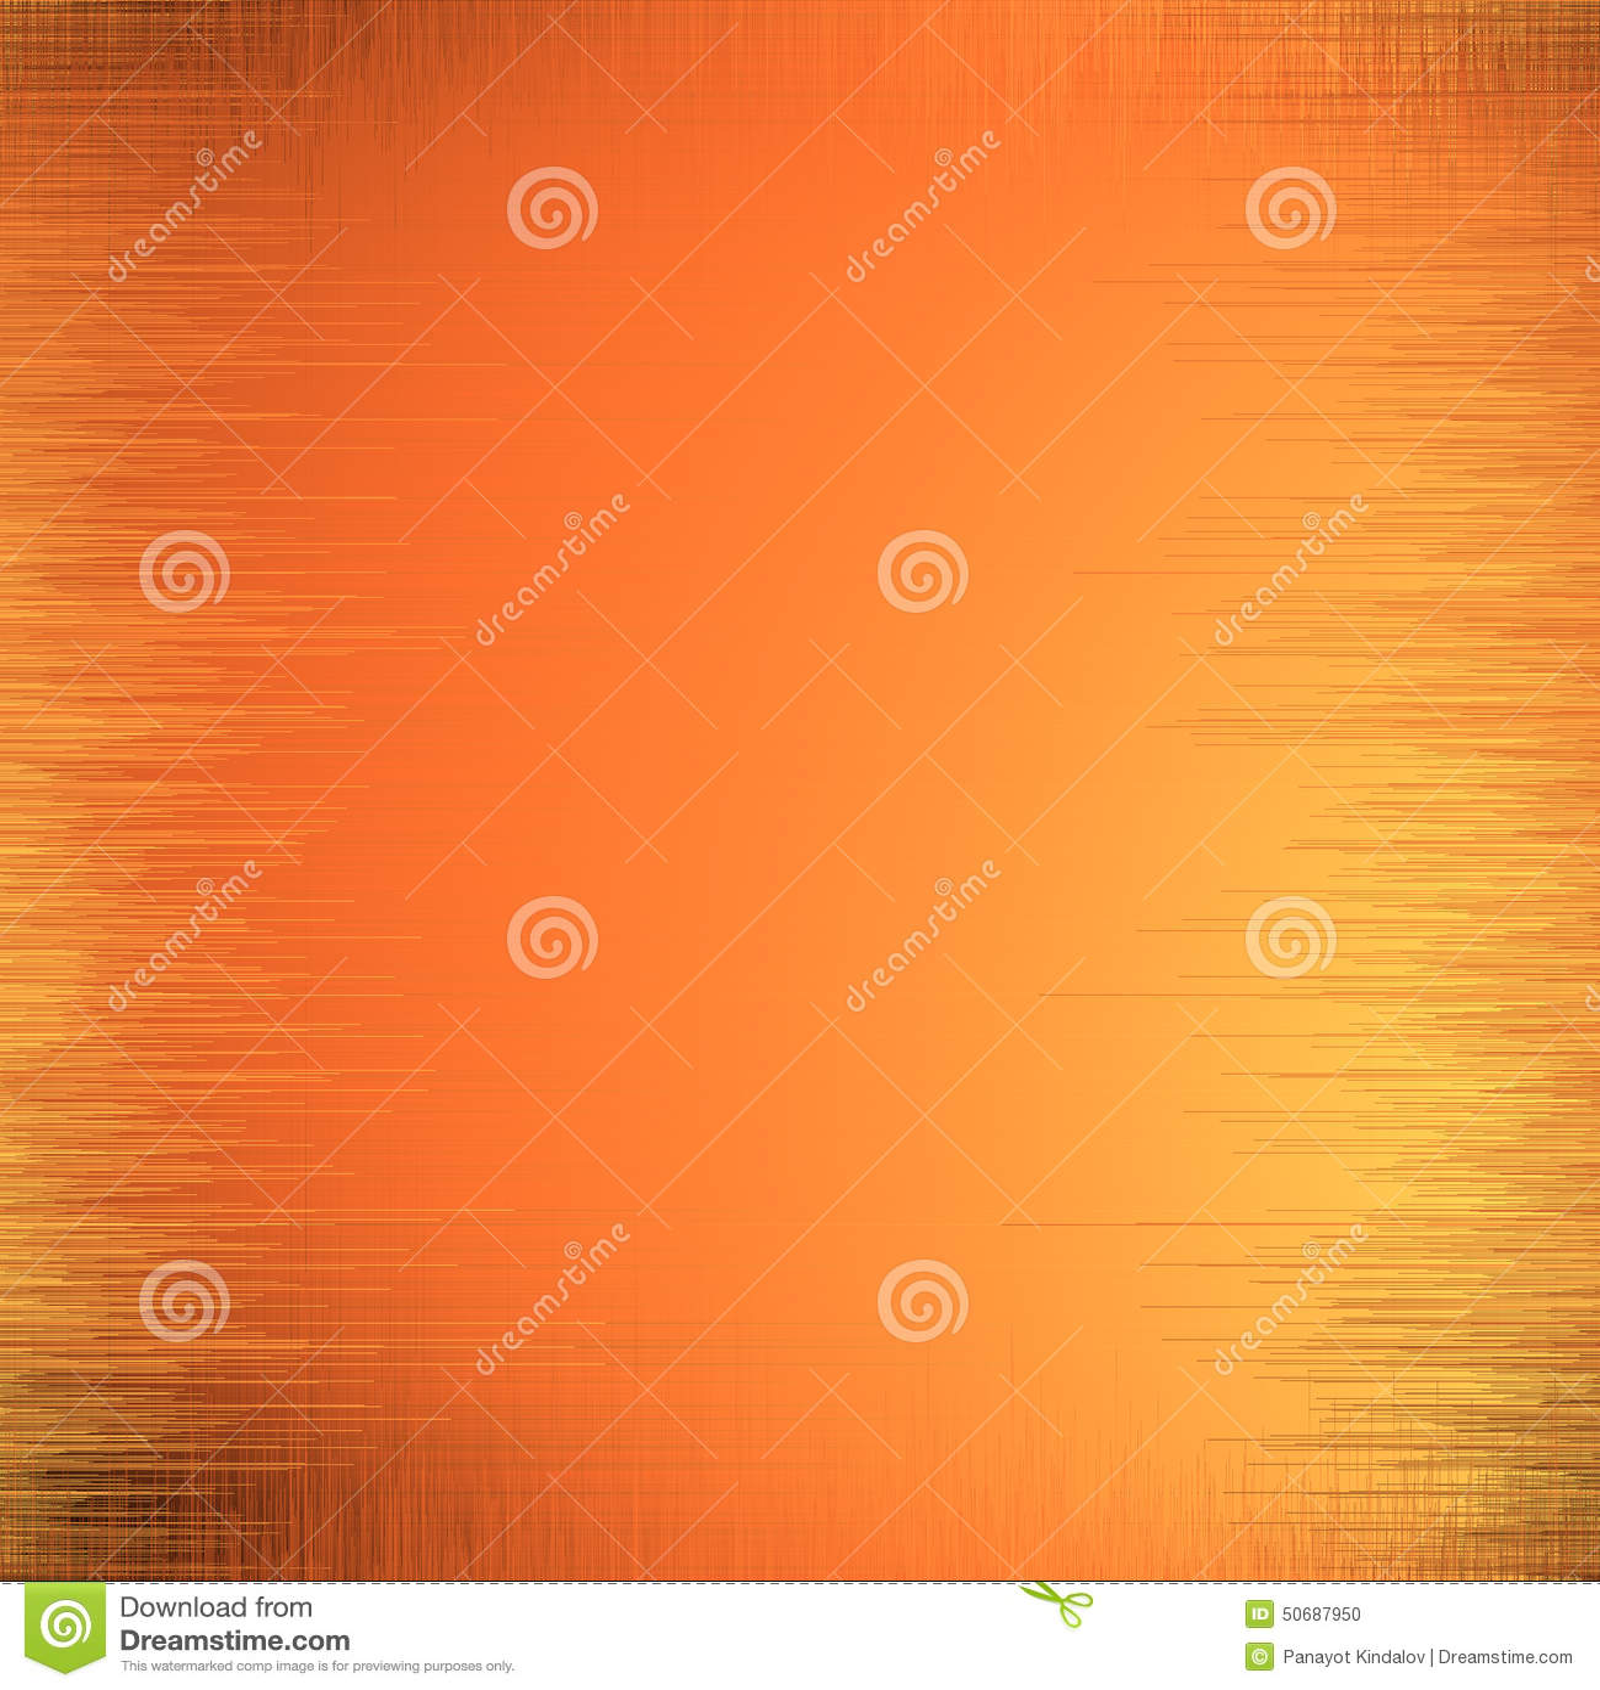 Download 橙色背景 库存例证. 插画 包括有 概念, 数字式, 魔术, 挣扎的, 黑暗, 背包, 抽象, 动态, 幻想 - 50687950